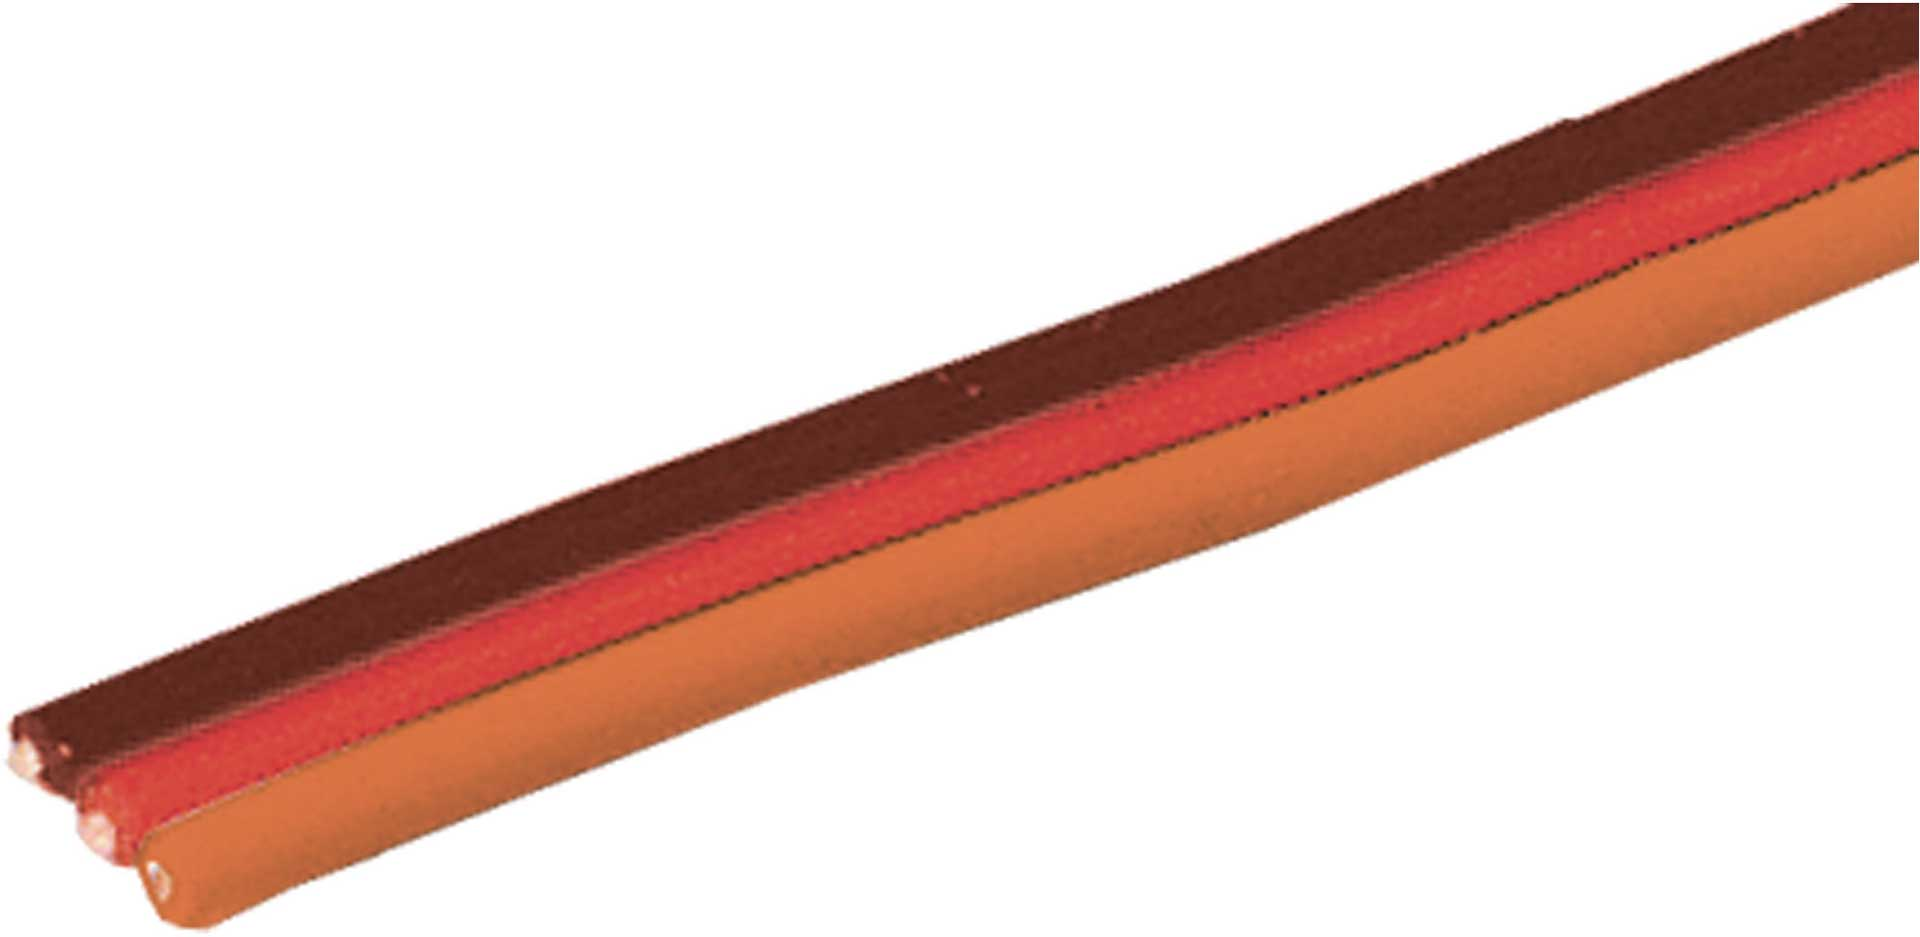 Robbe Modellsport Servokabel Graupner/JR/Uni 50 Meter flach 0,13mm² (26AWG) PVC Meterware